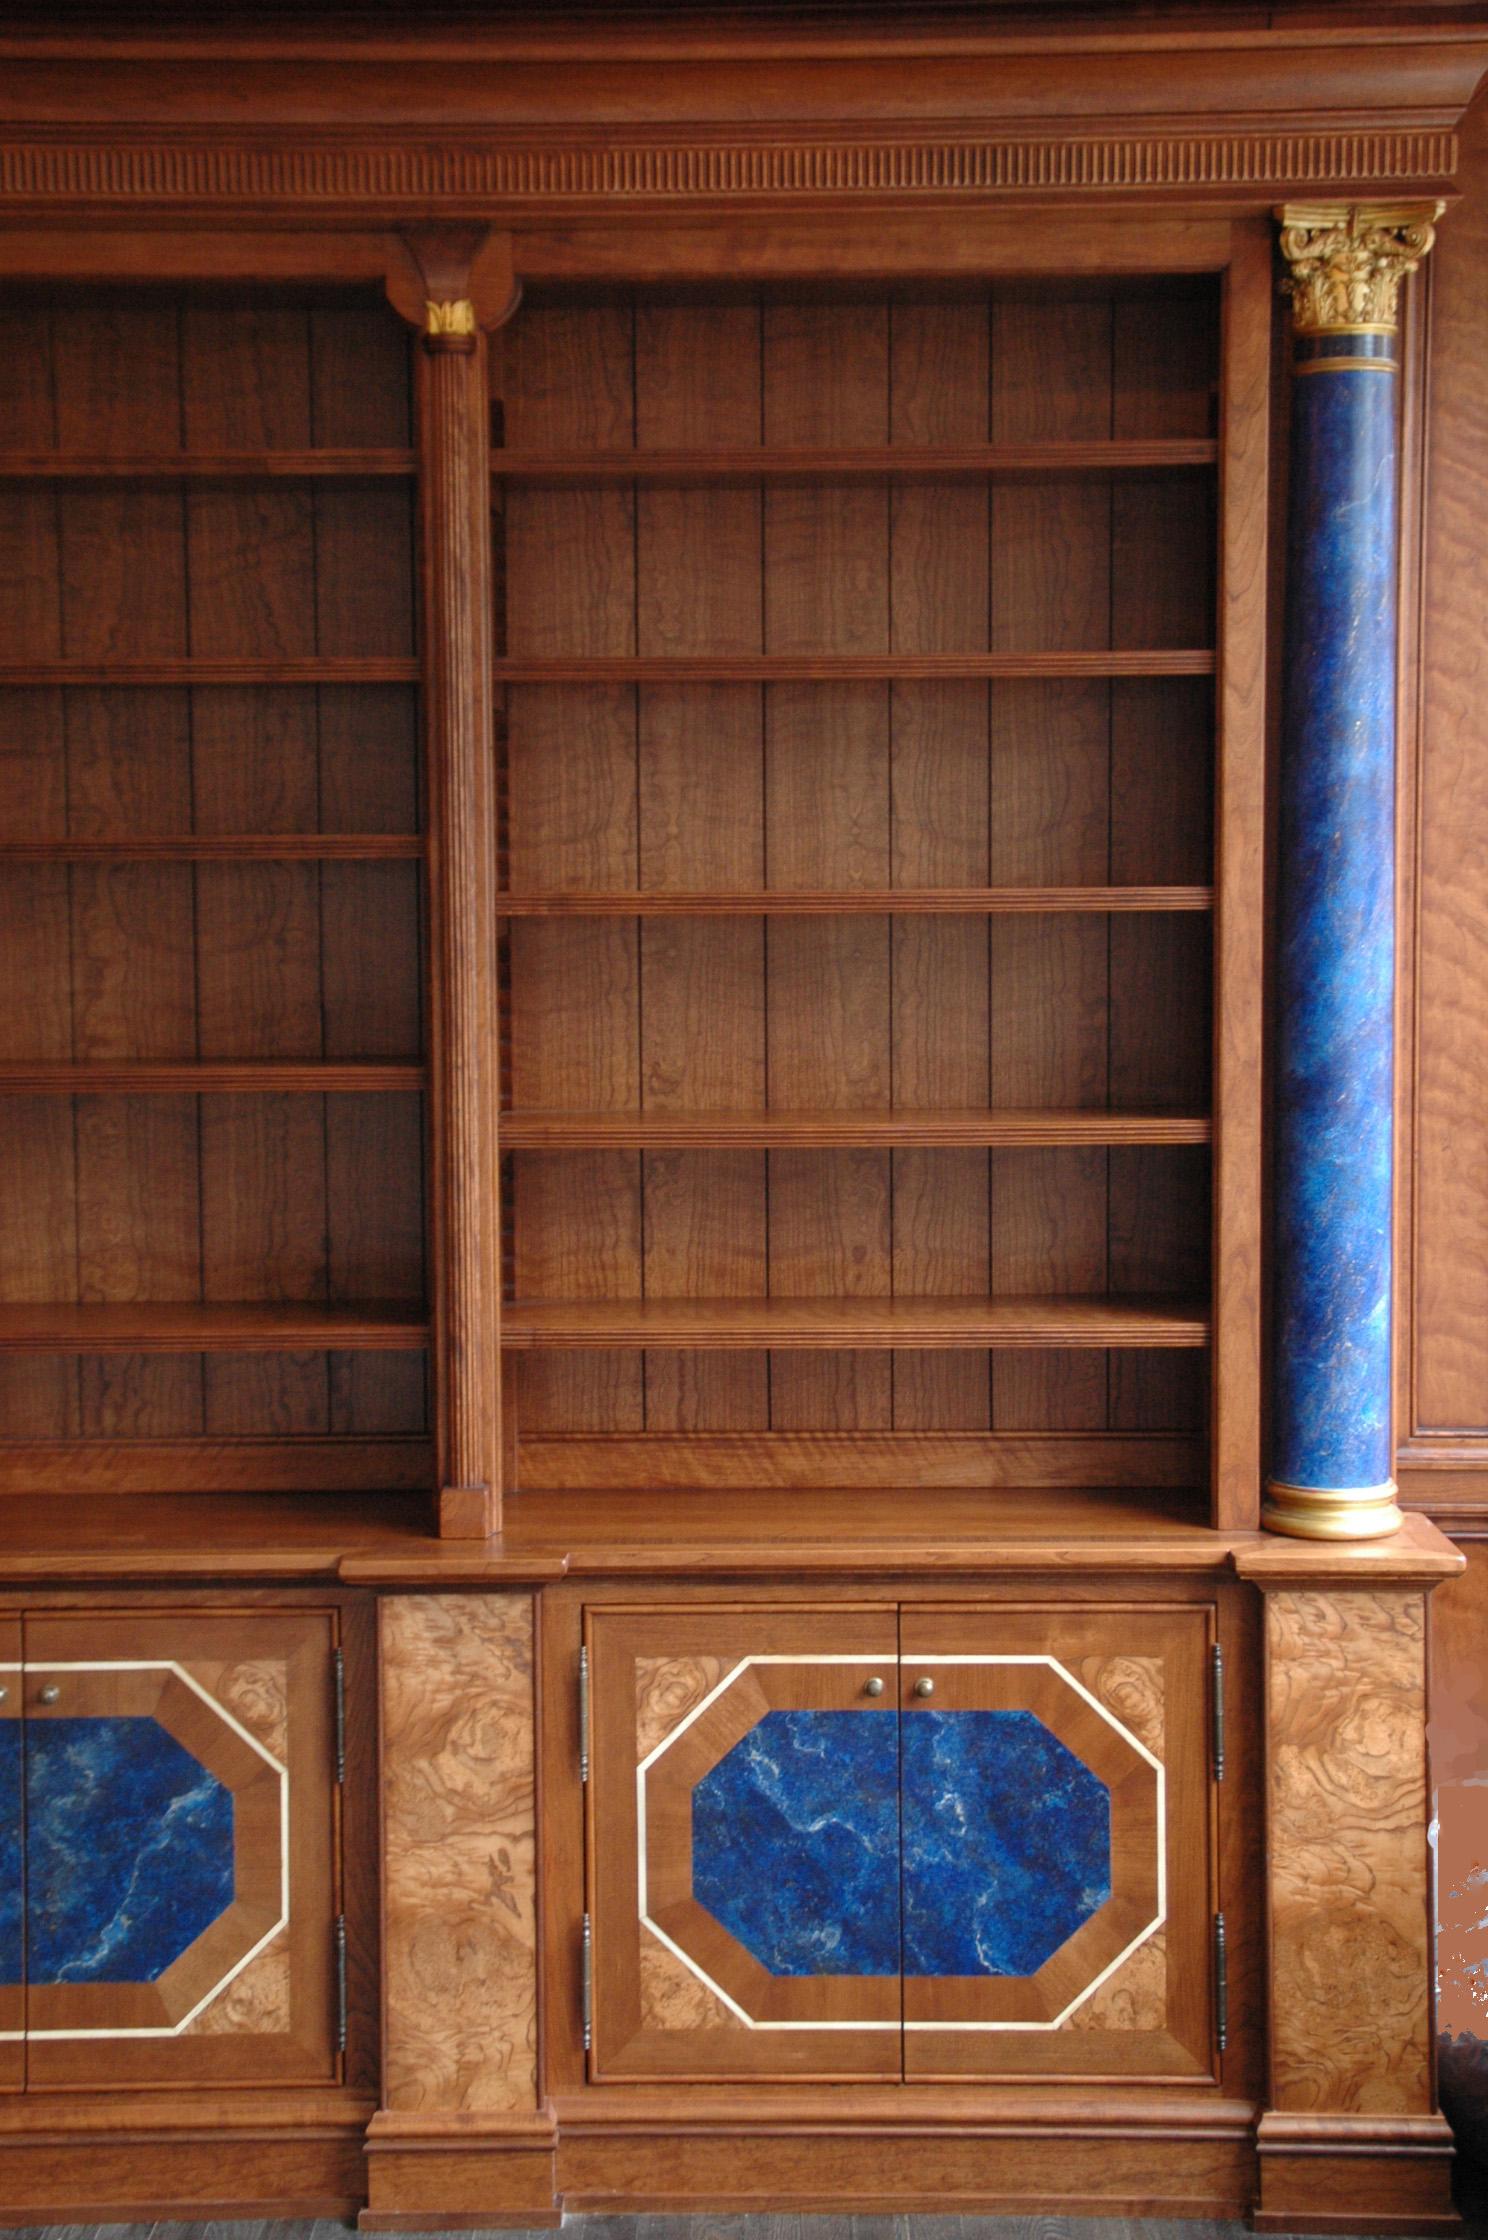 Faux Lapis Lazuli column and panels